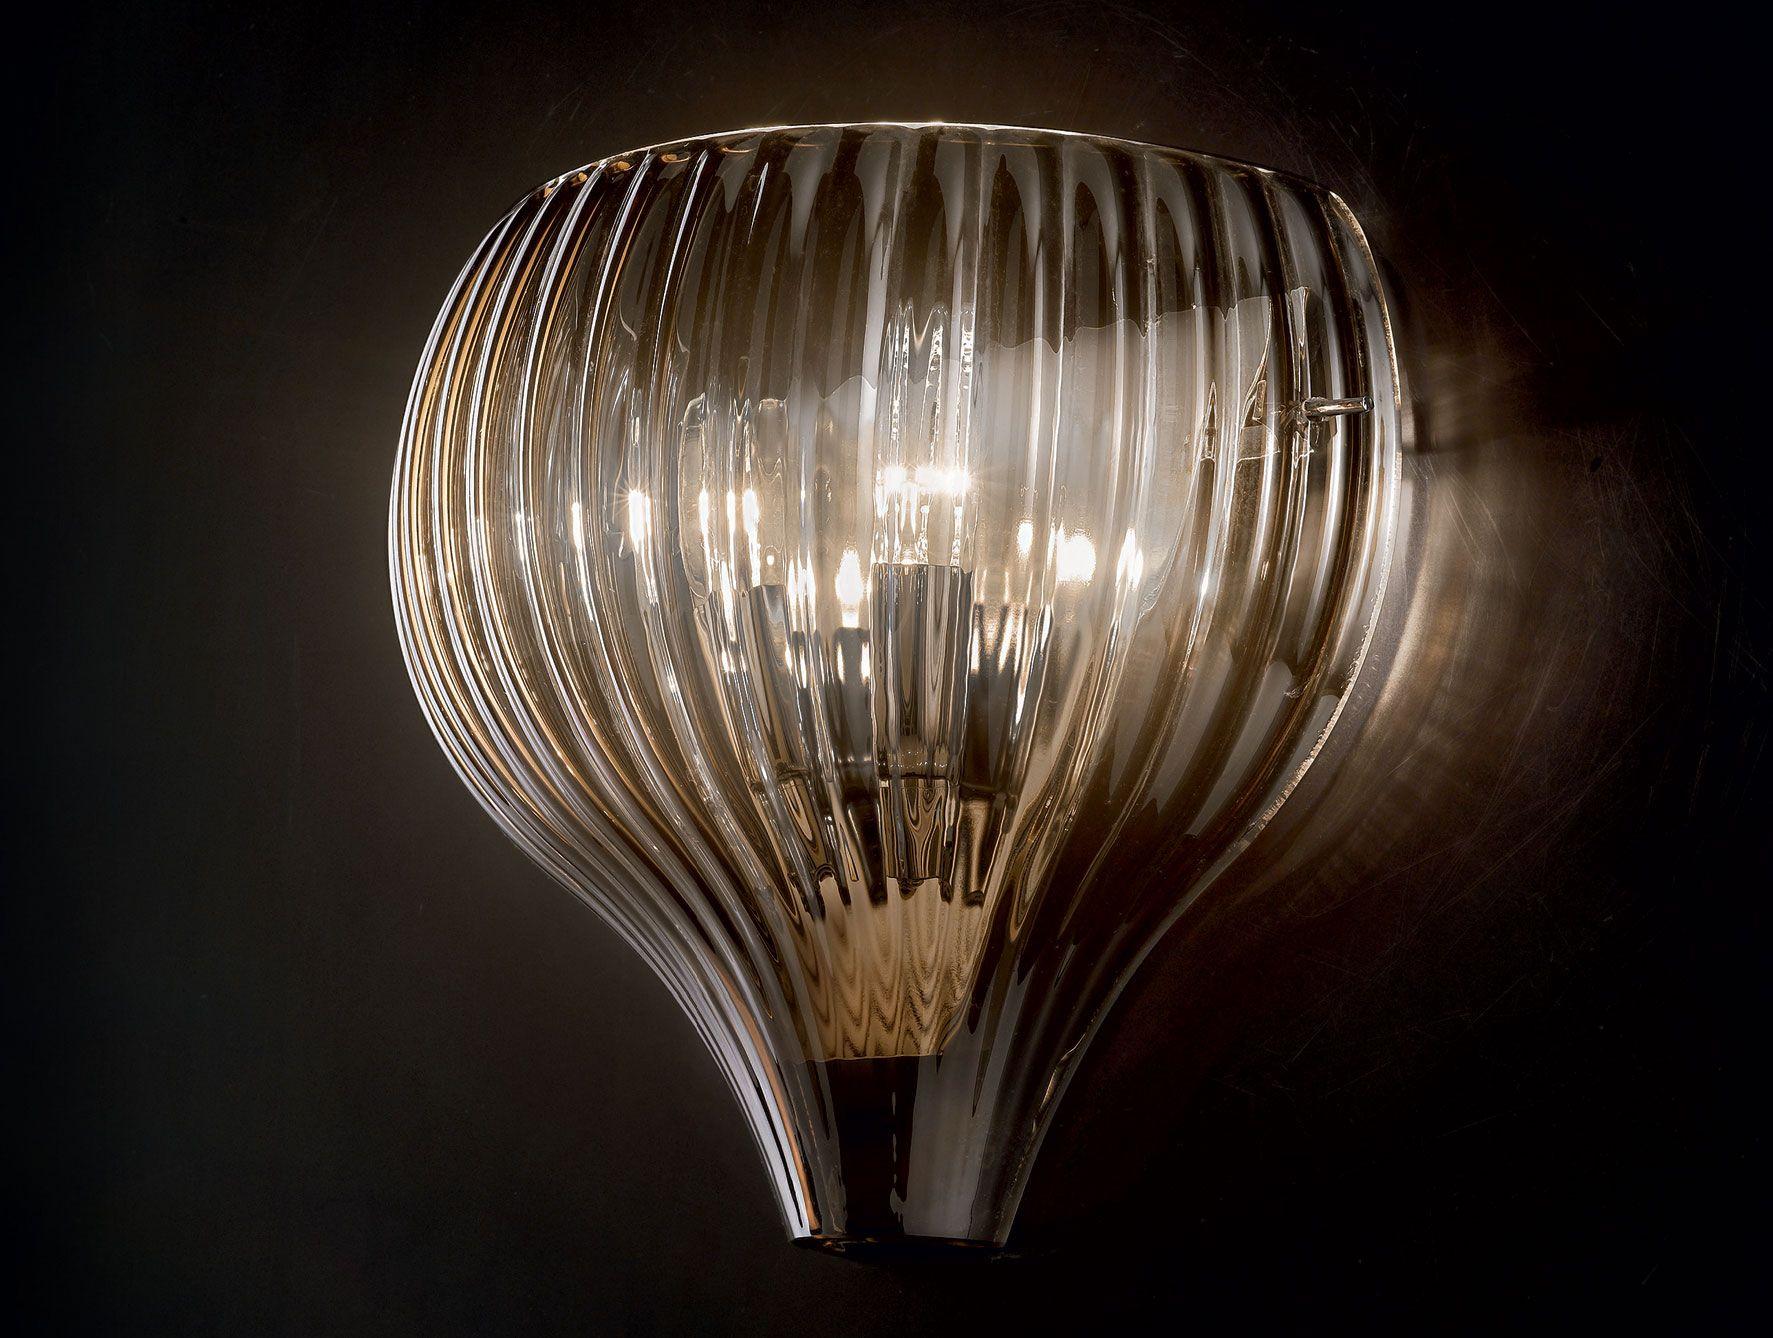 Pin by Hattie Boom on Lighting | Pinterest | Designer wall lights ...